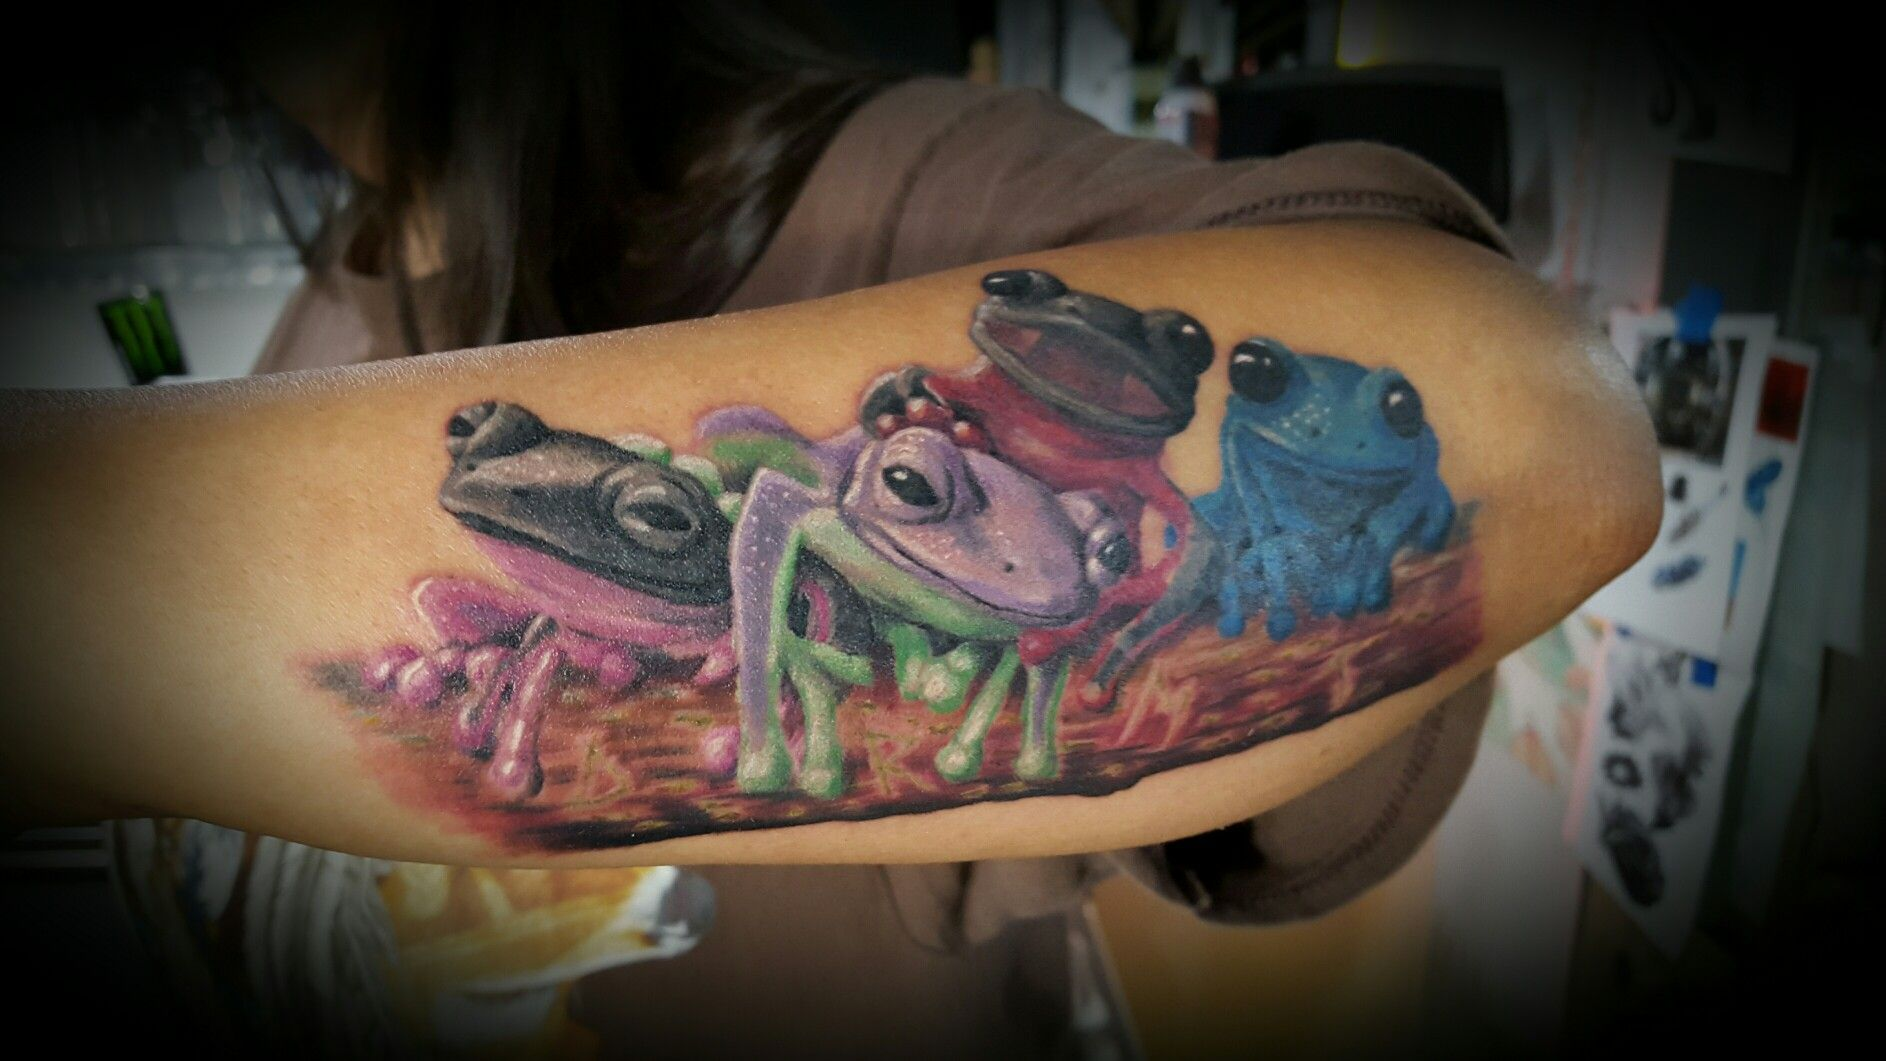 Custom Tree Frog Tattoo Tree Frog Tattoos Frog Tattoos Tattoos